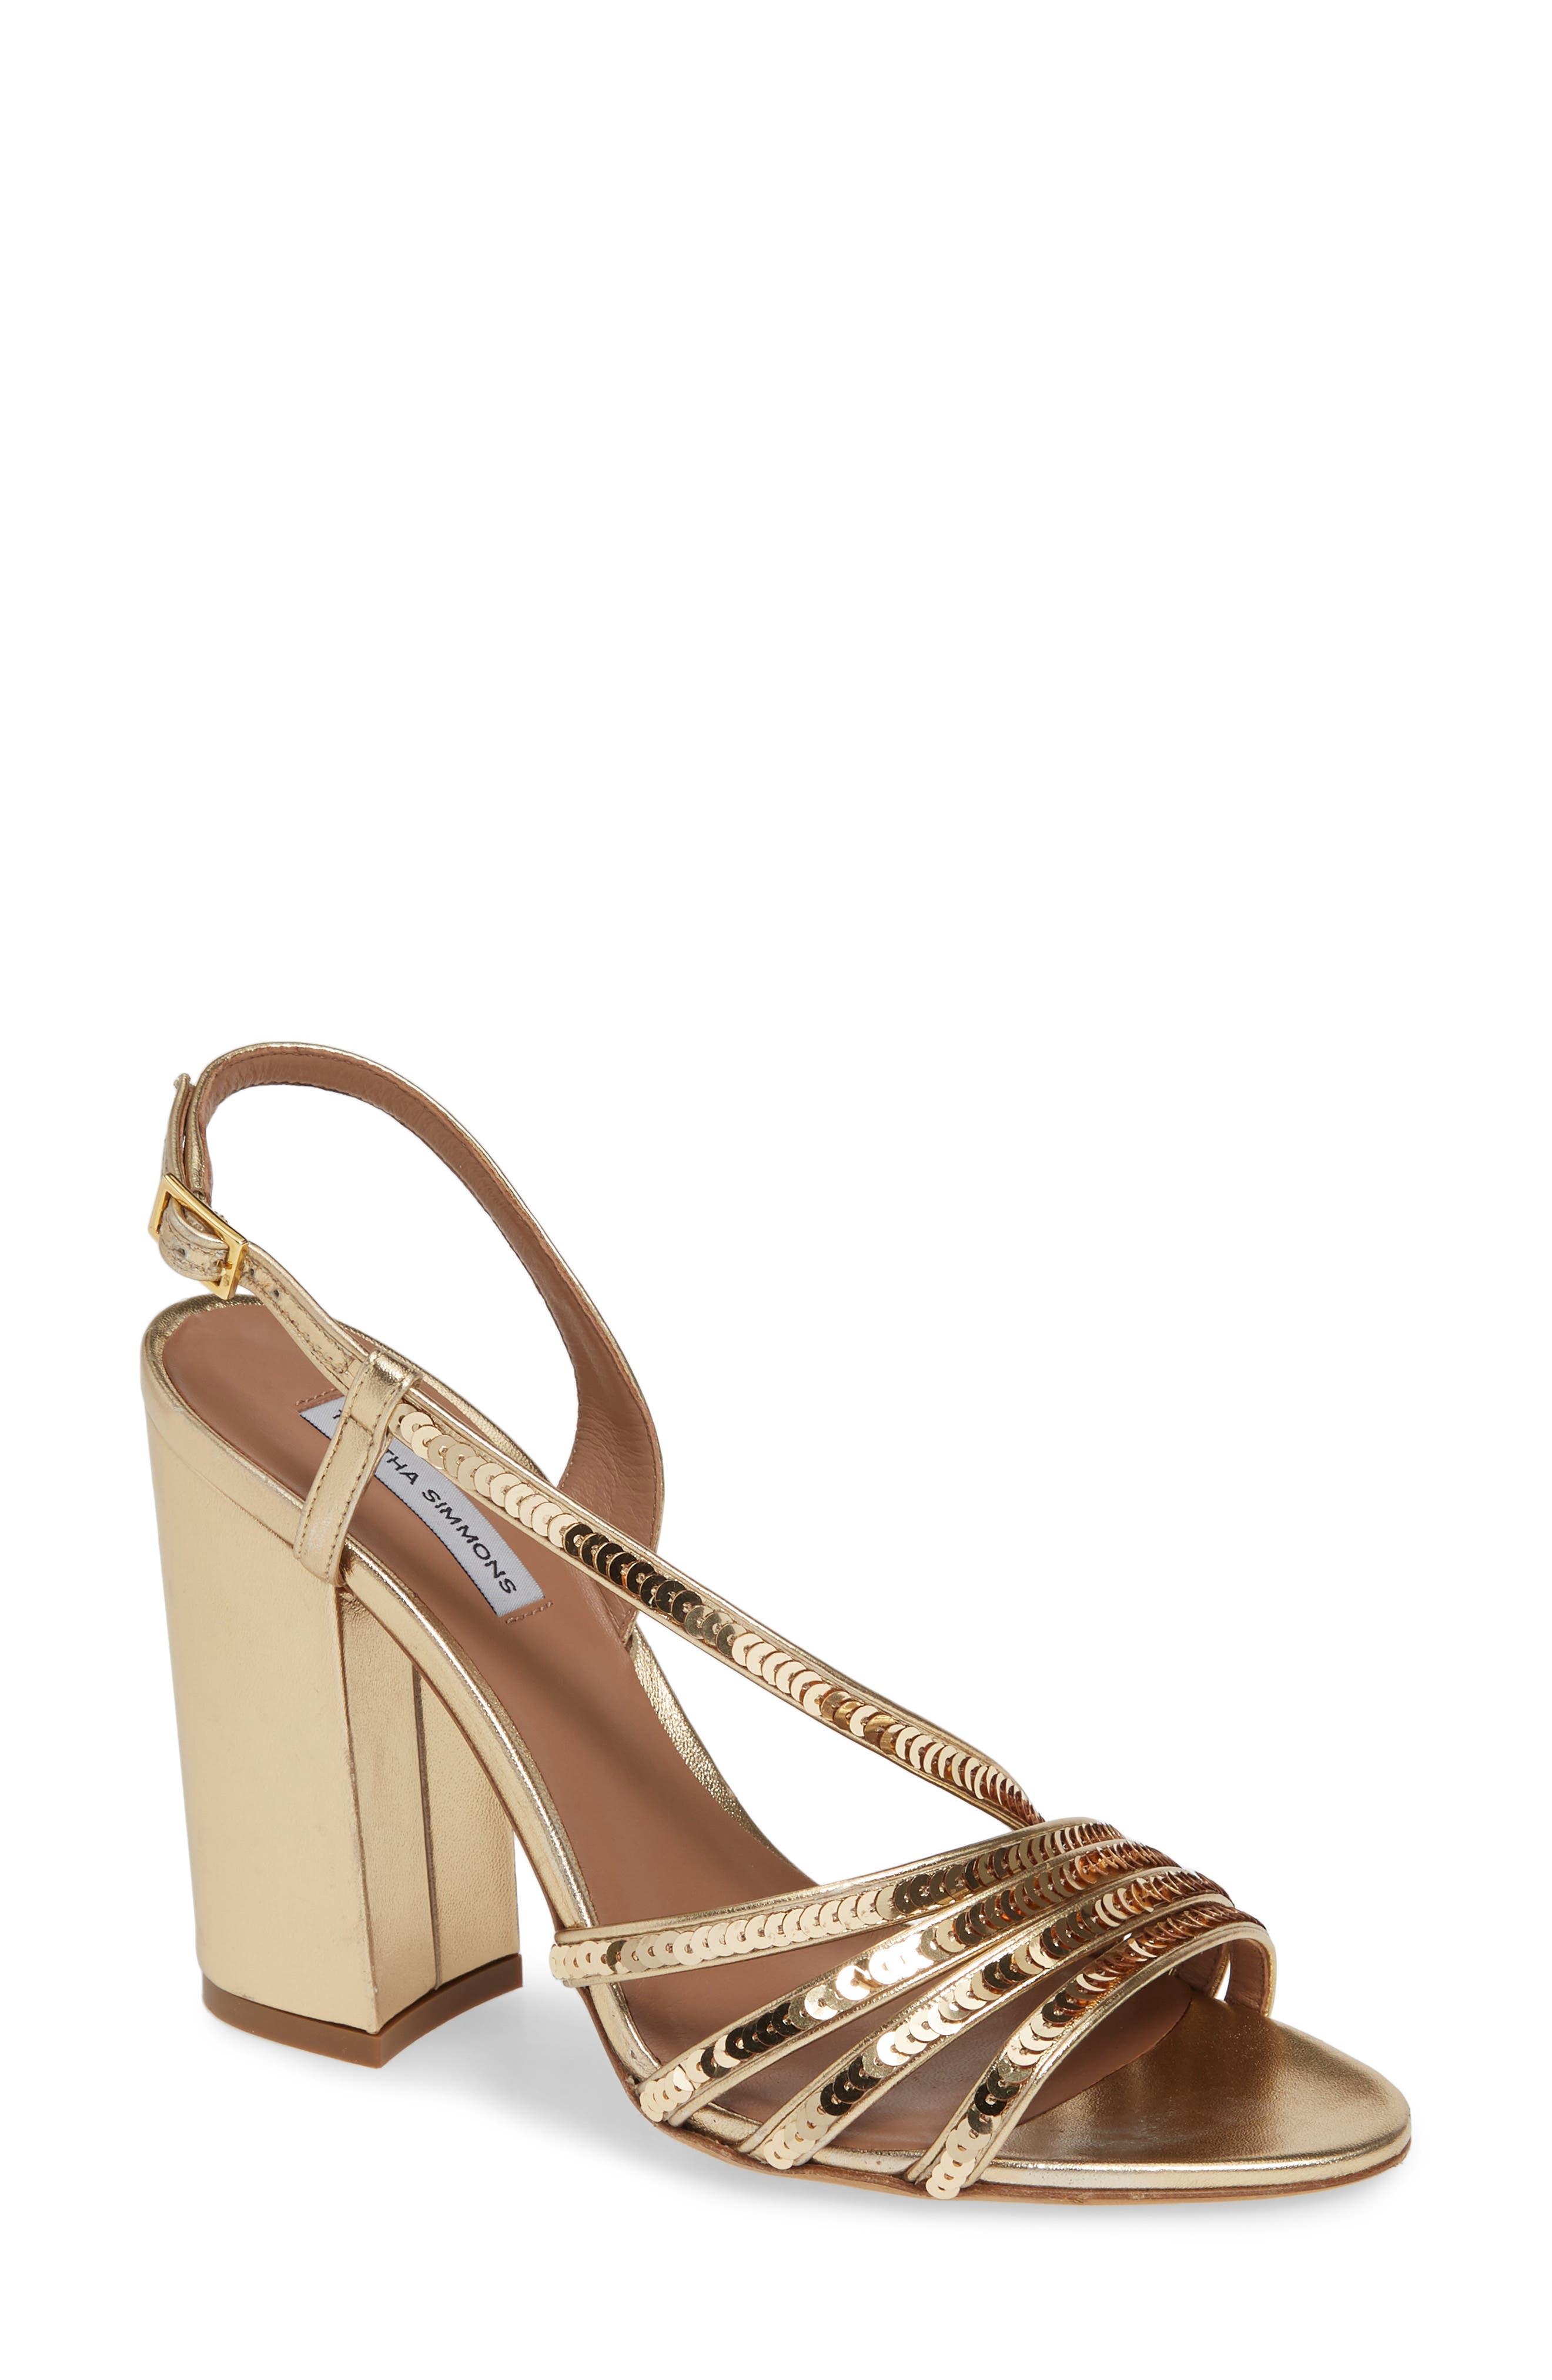 Tabitha Simmons Viola Sequin Embellished Sandal, Metallic